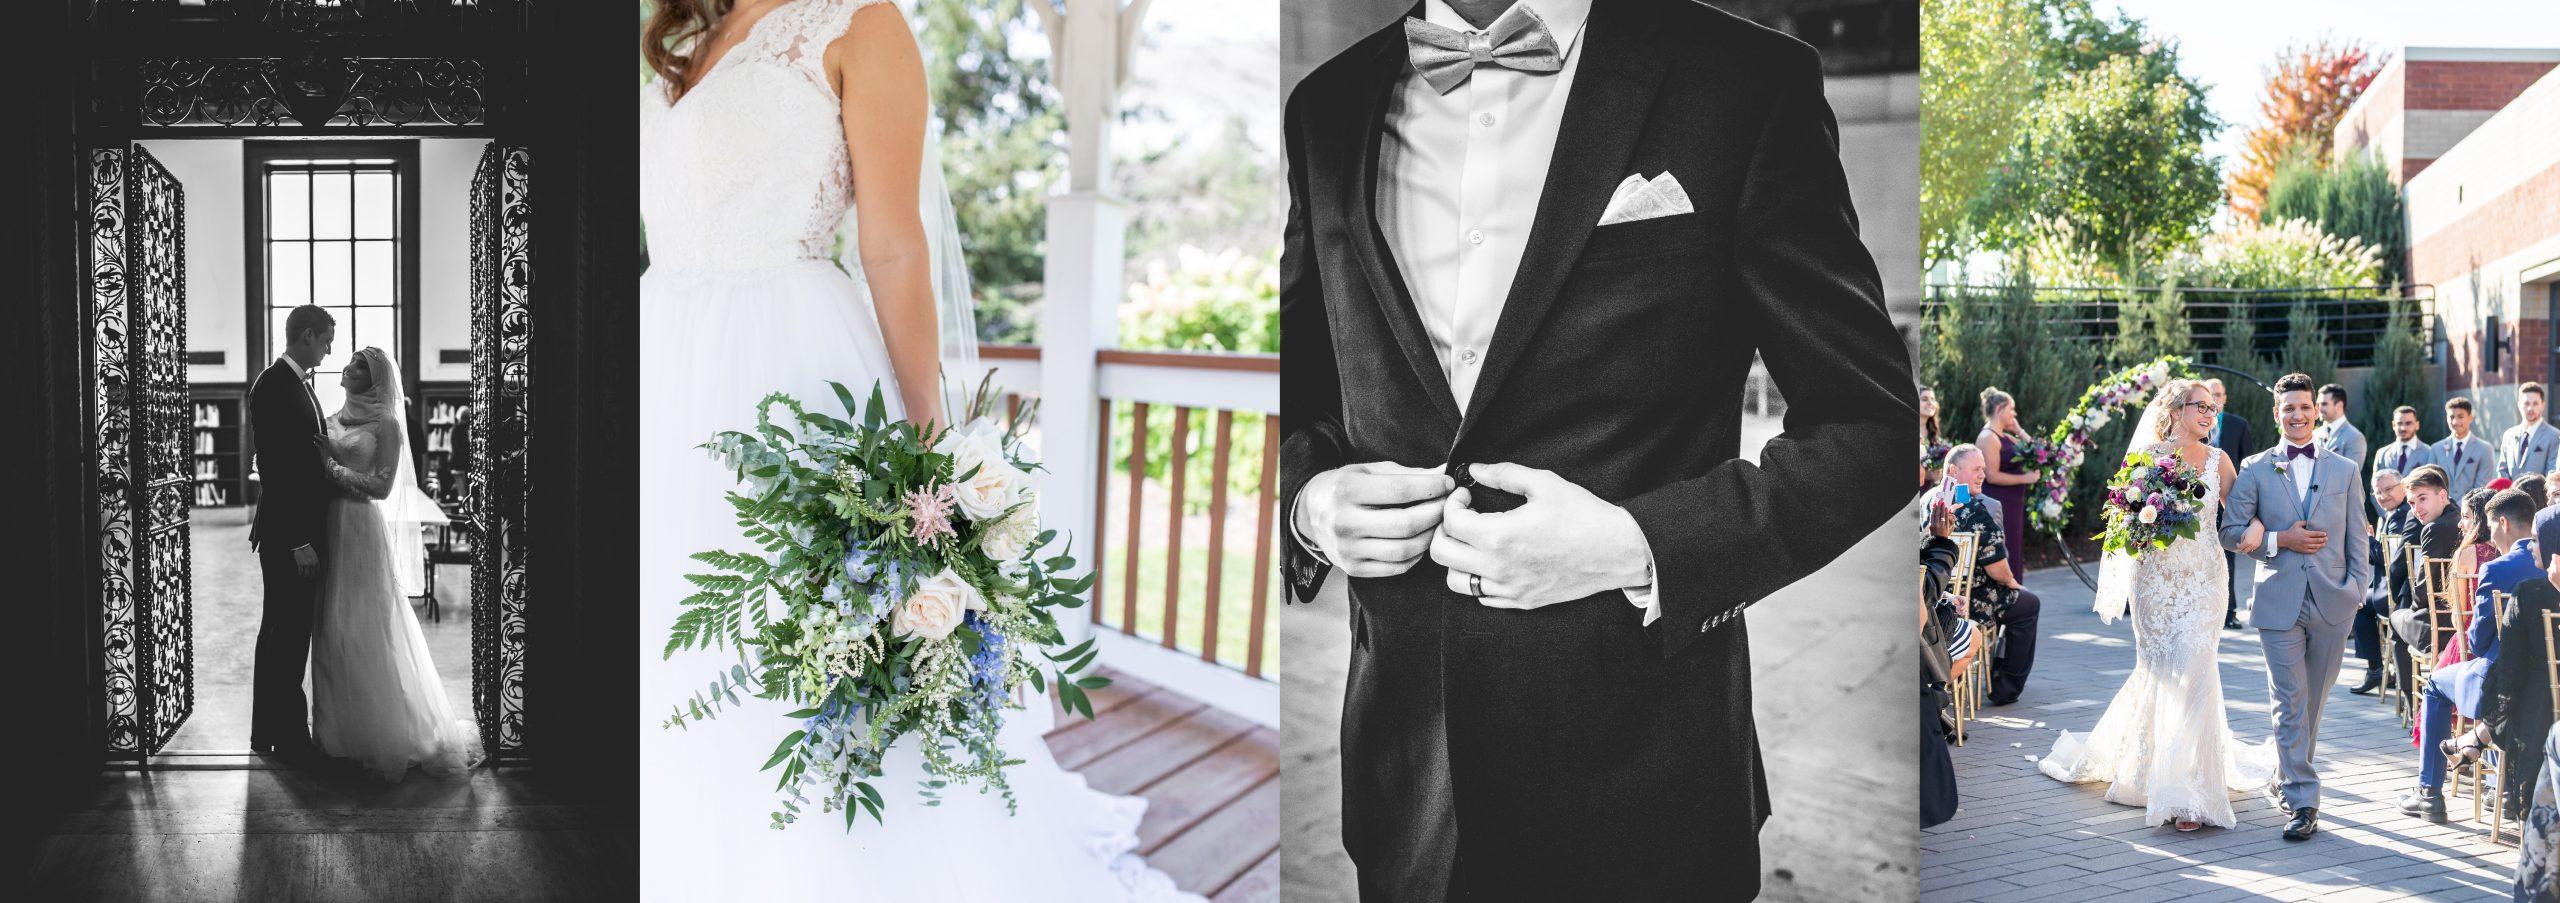 kandra-lynn-photography-michigan-wedding-photographer-19